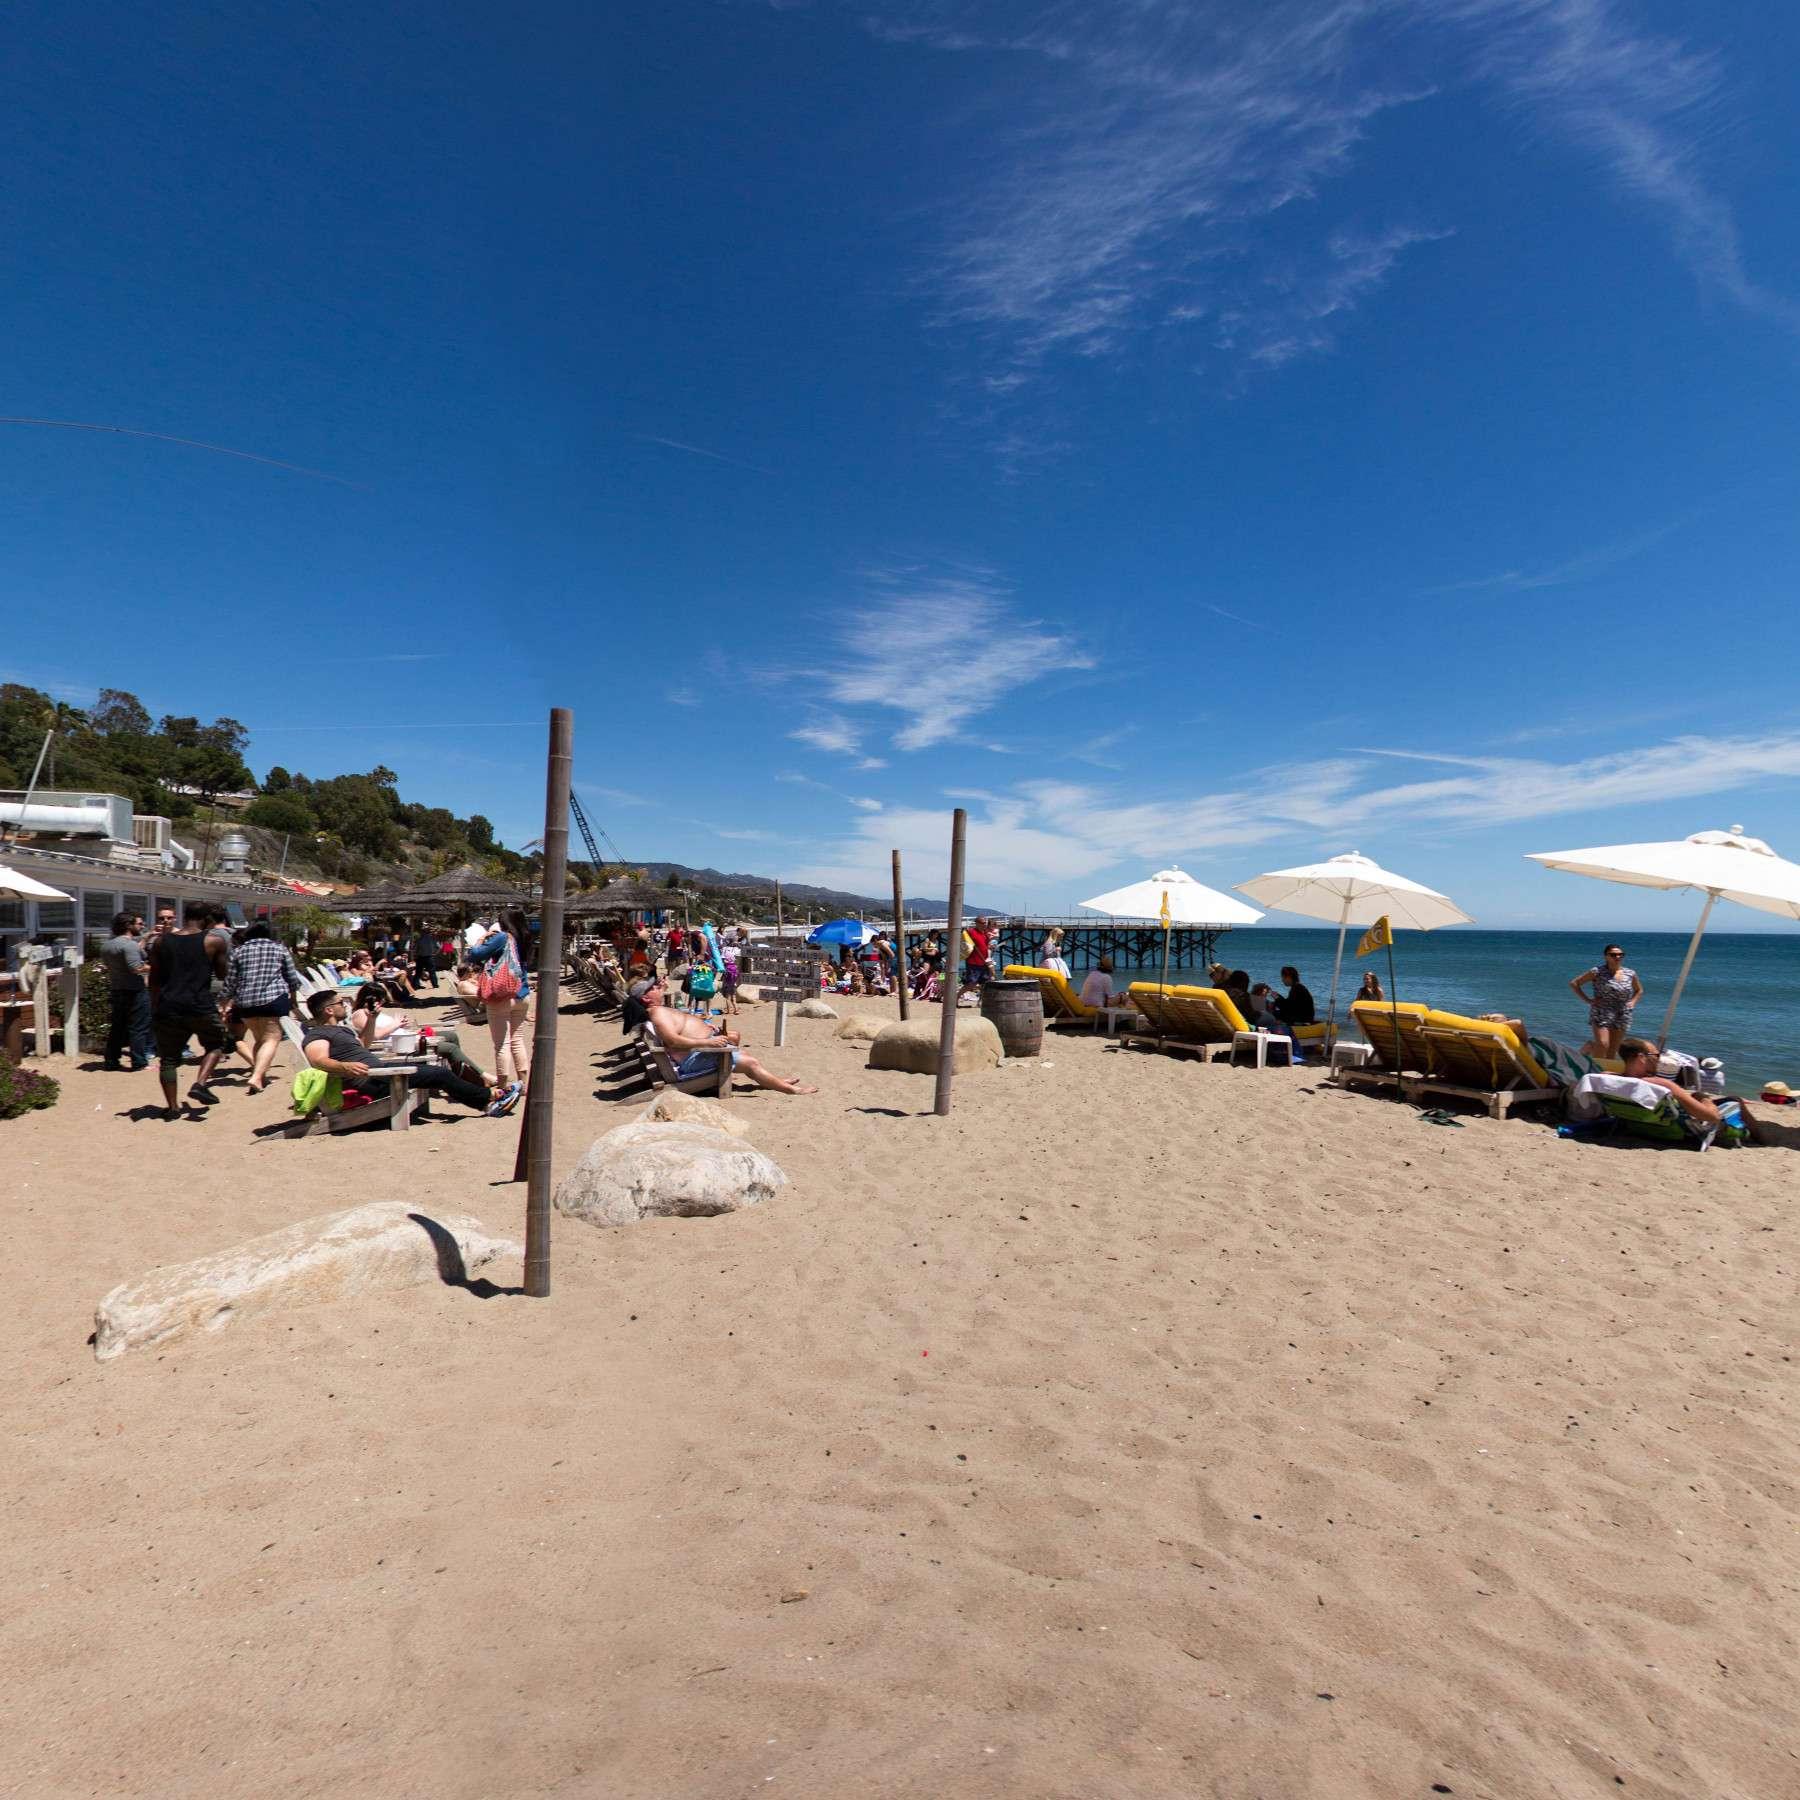 Bob Morris S Paradise Cove Beach Cafe In Malibu California